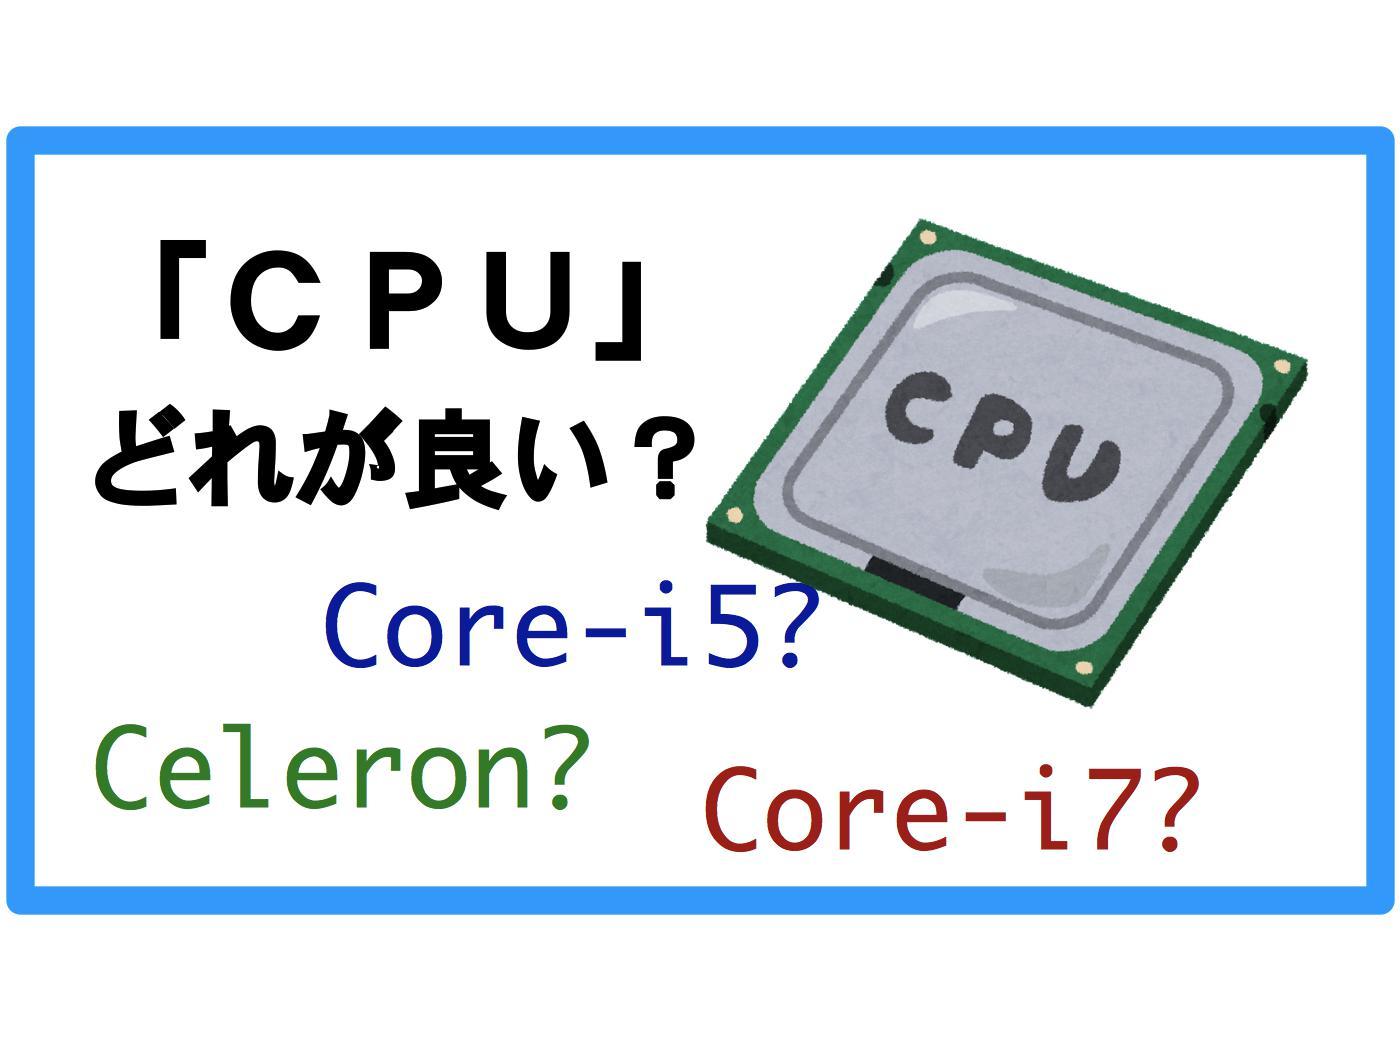 cpu iiyama イーヤマ ノートパソコン ノートPC PC